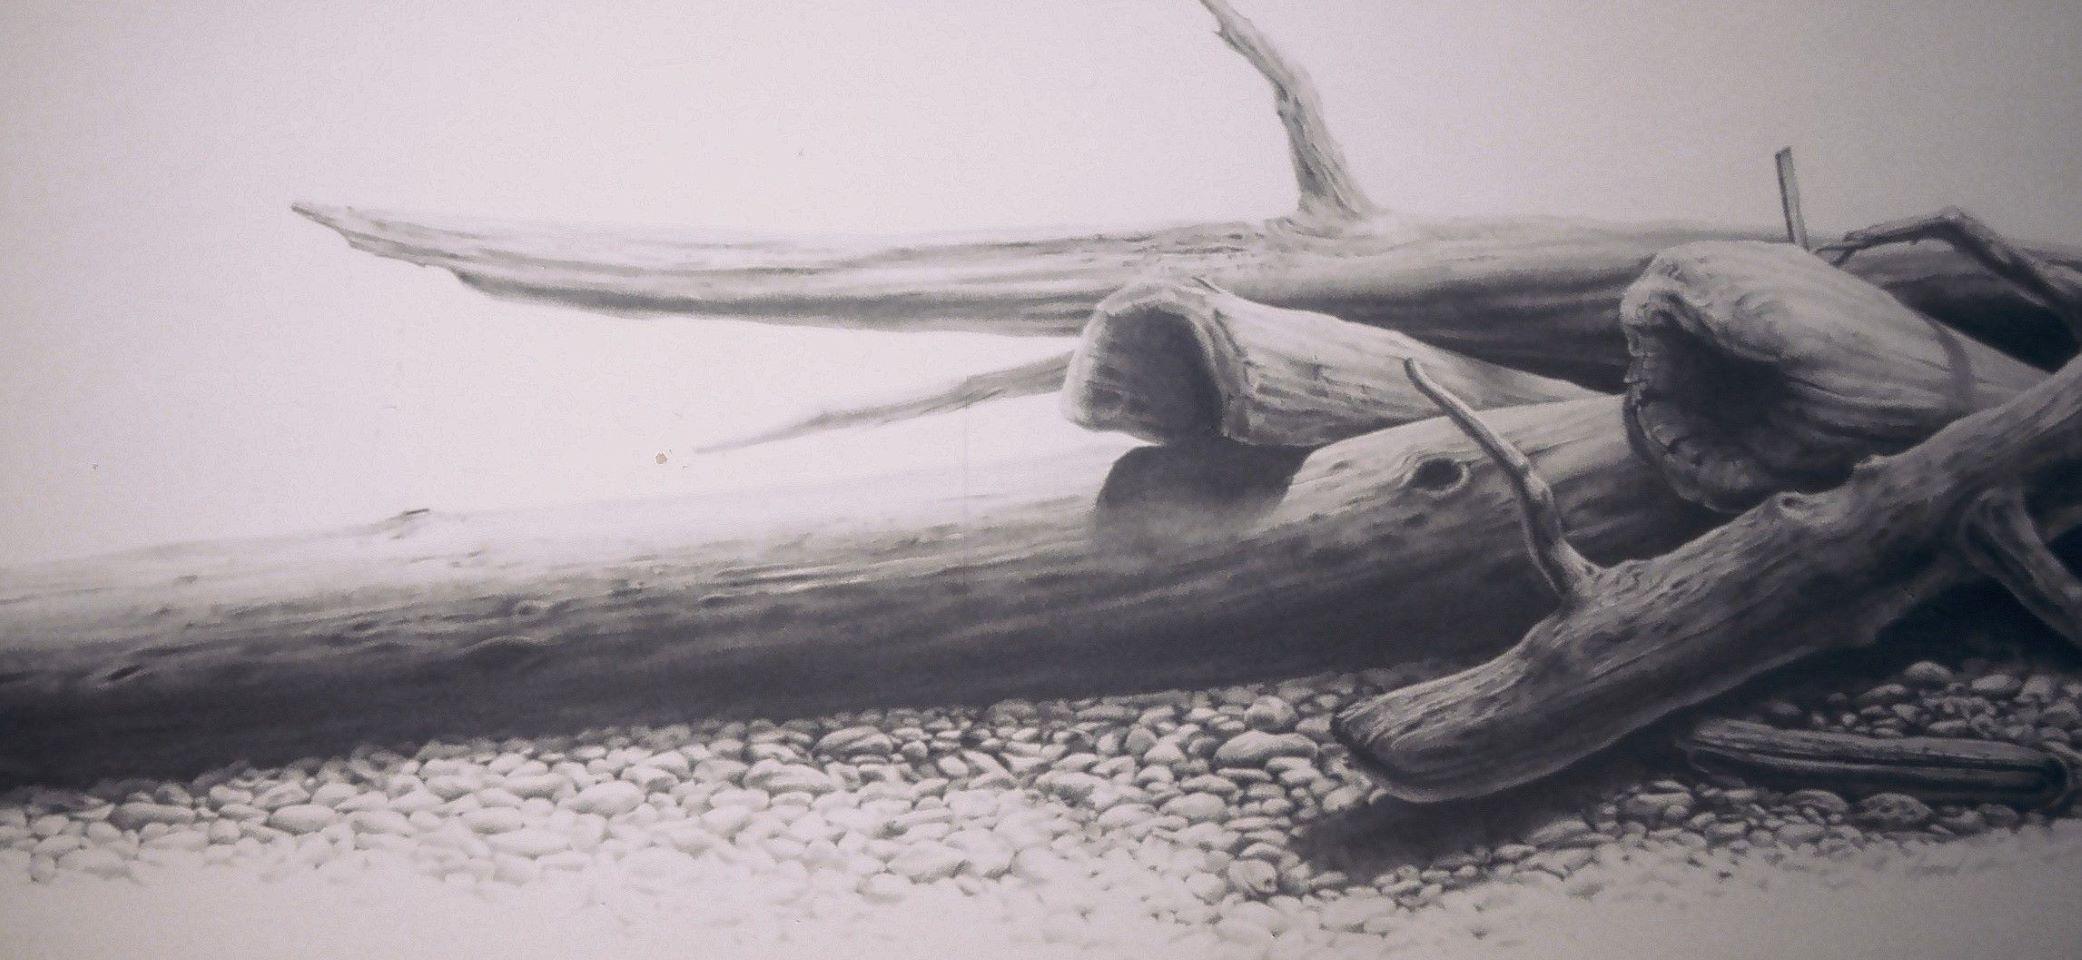 driftwood on a peach